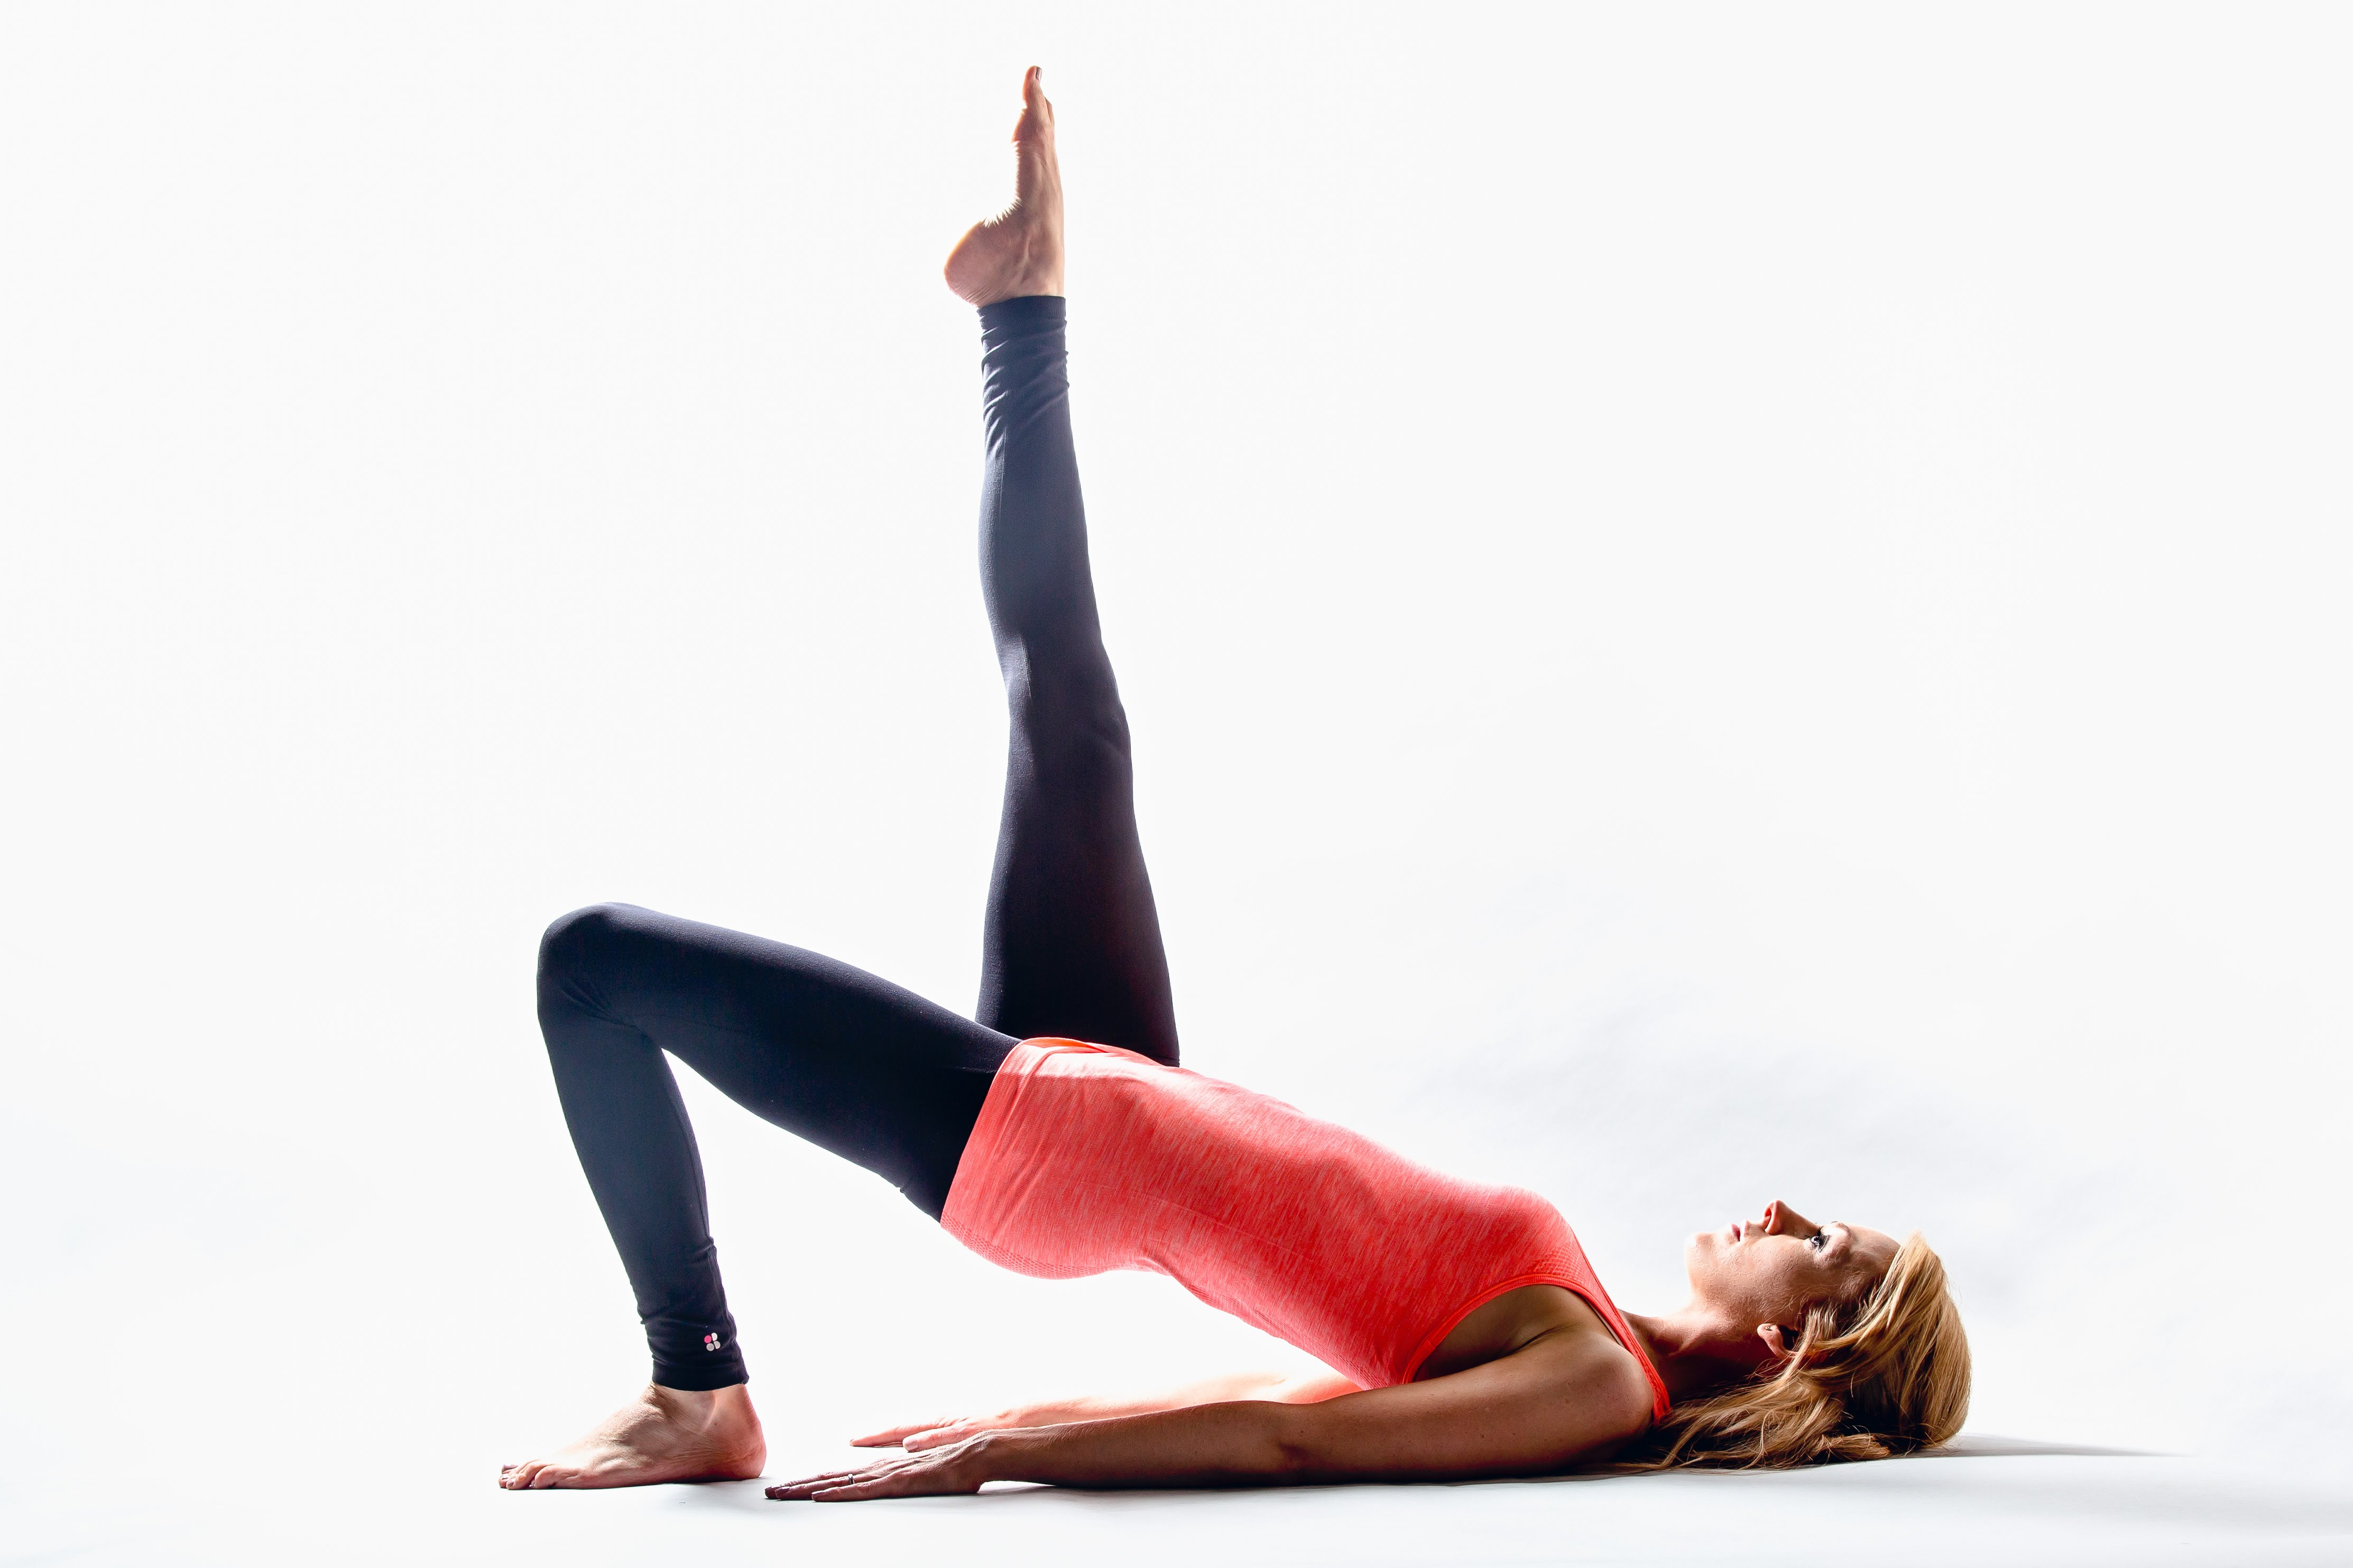 Pilates Glute Exercises